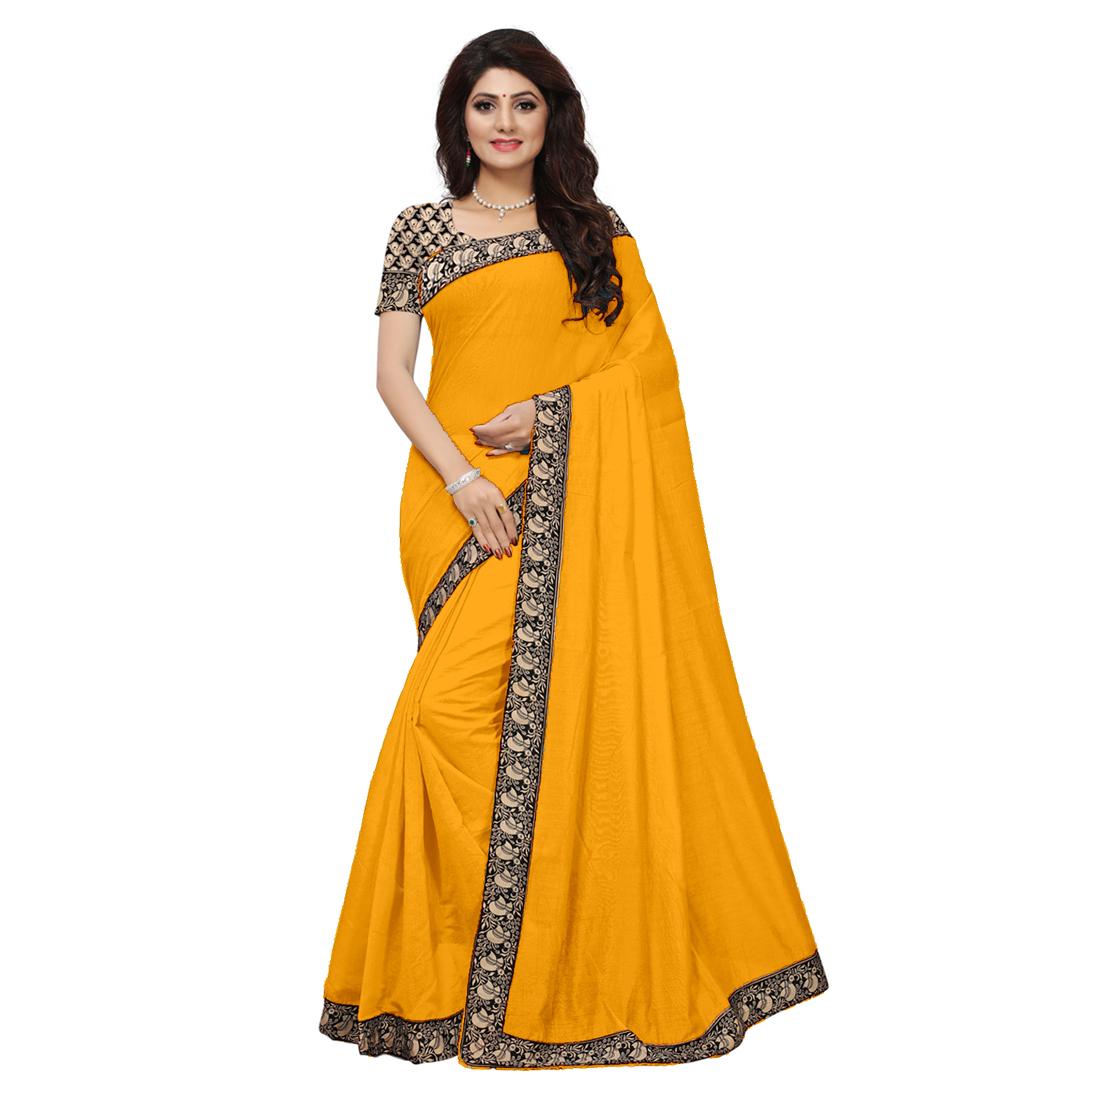 Chanderi Silk Saree, Casual Wear Saree